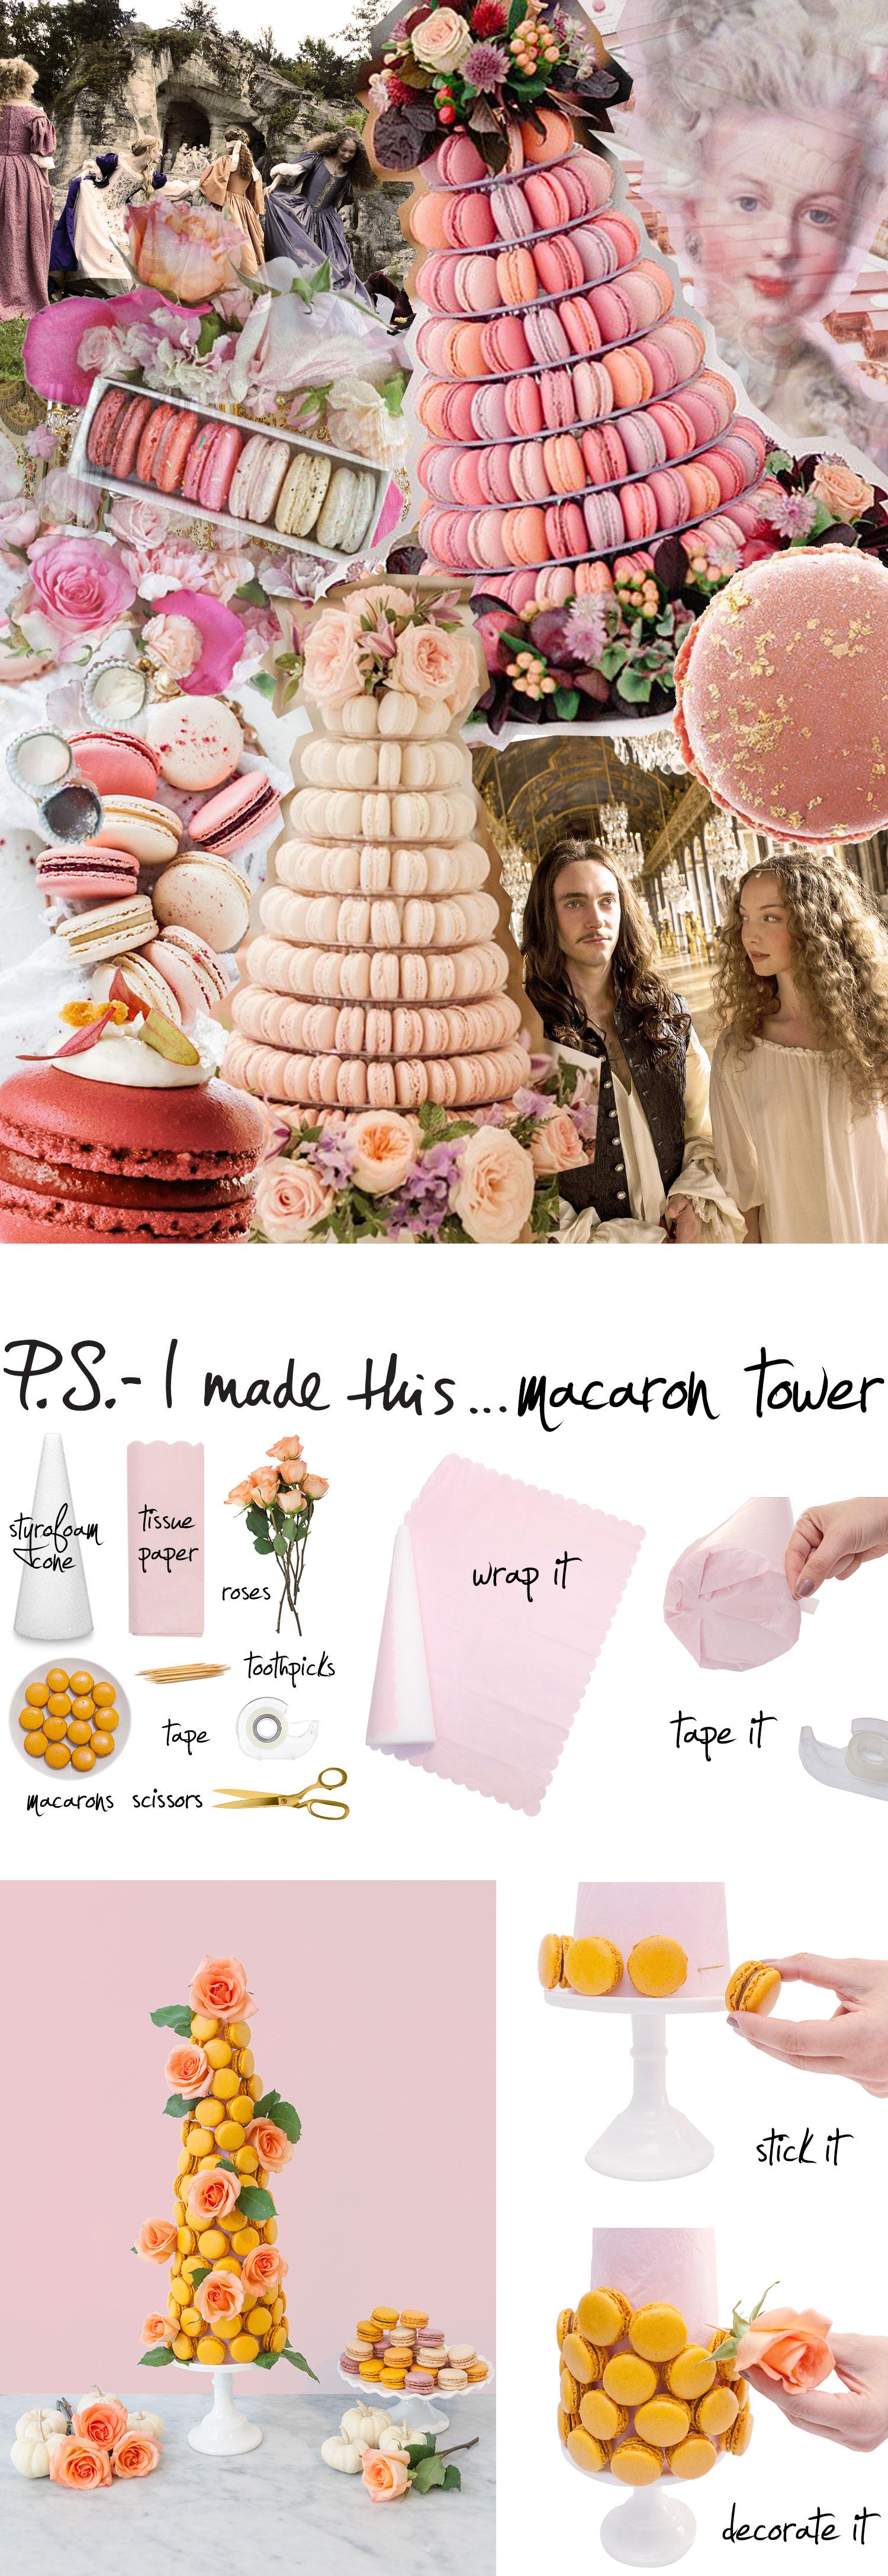 macaron-tower